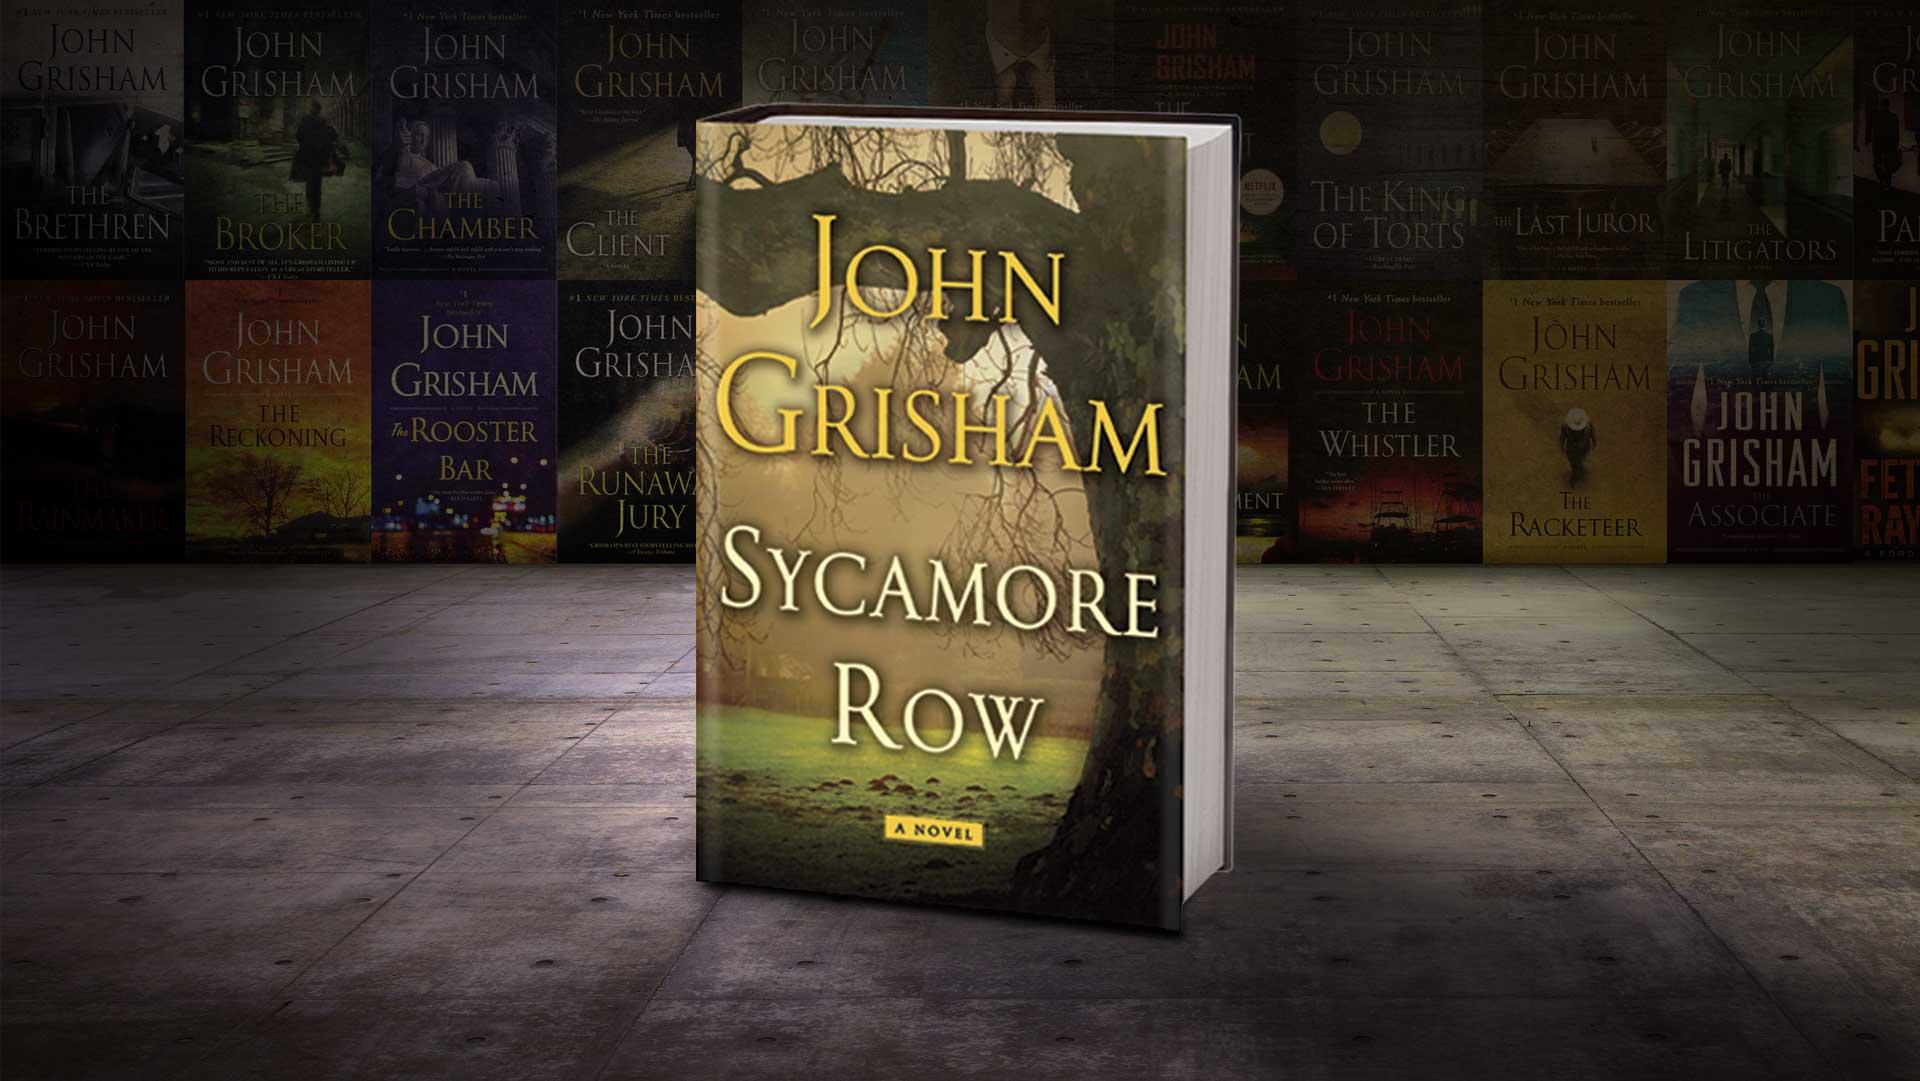 SYCAMORE ROW - John Grisham